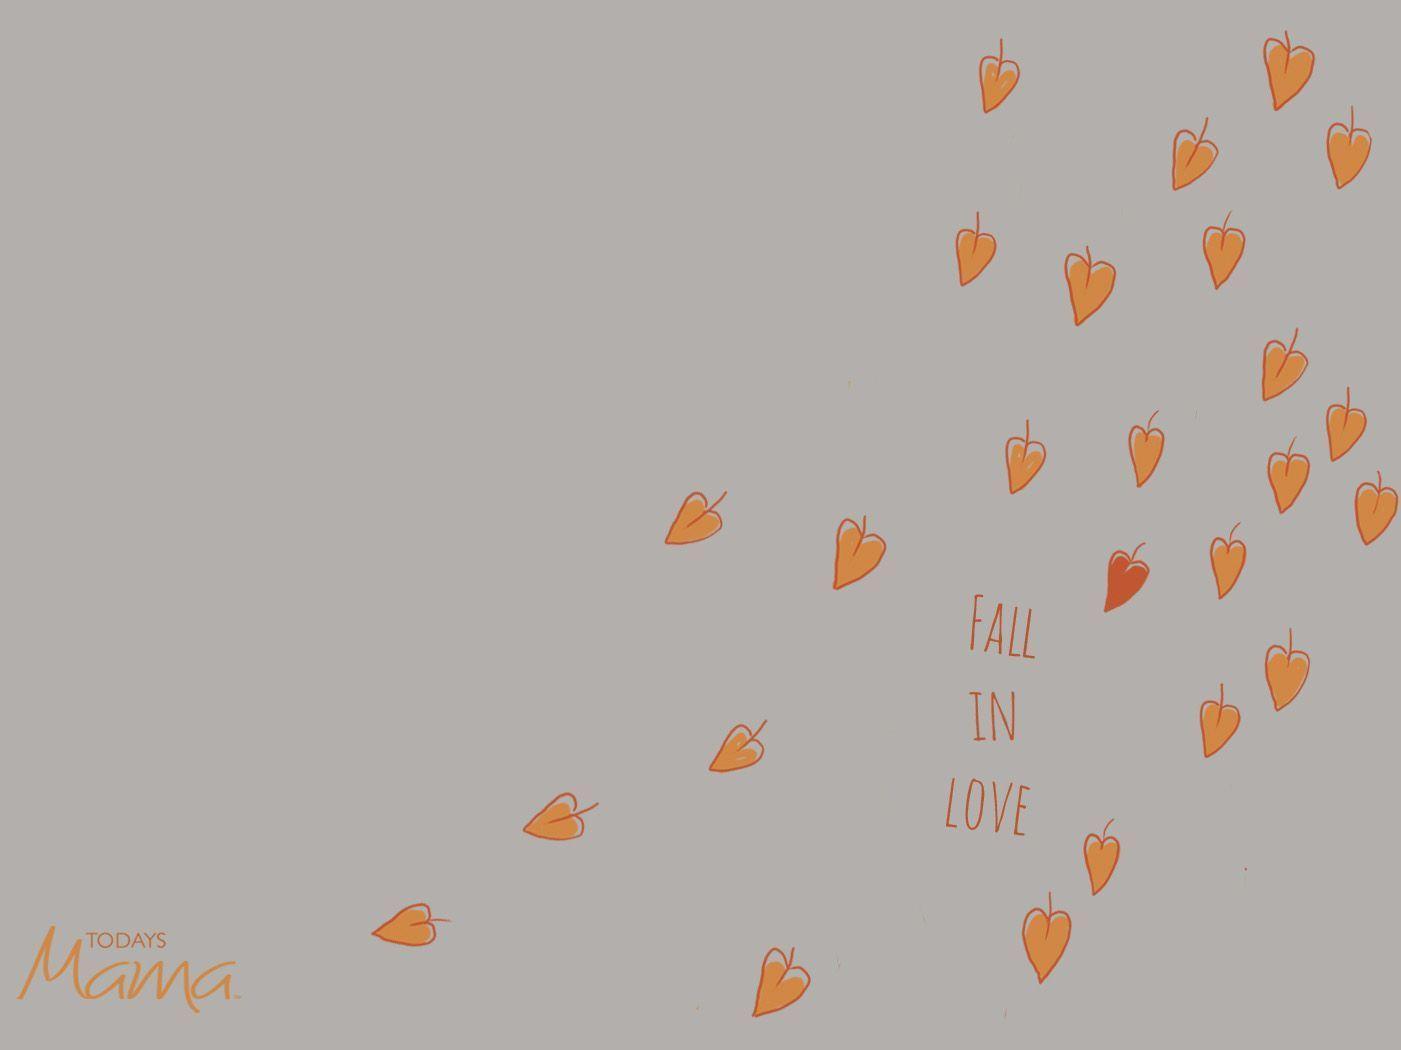 cute fall wallpapers wallpaper cave